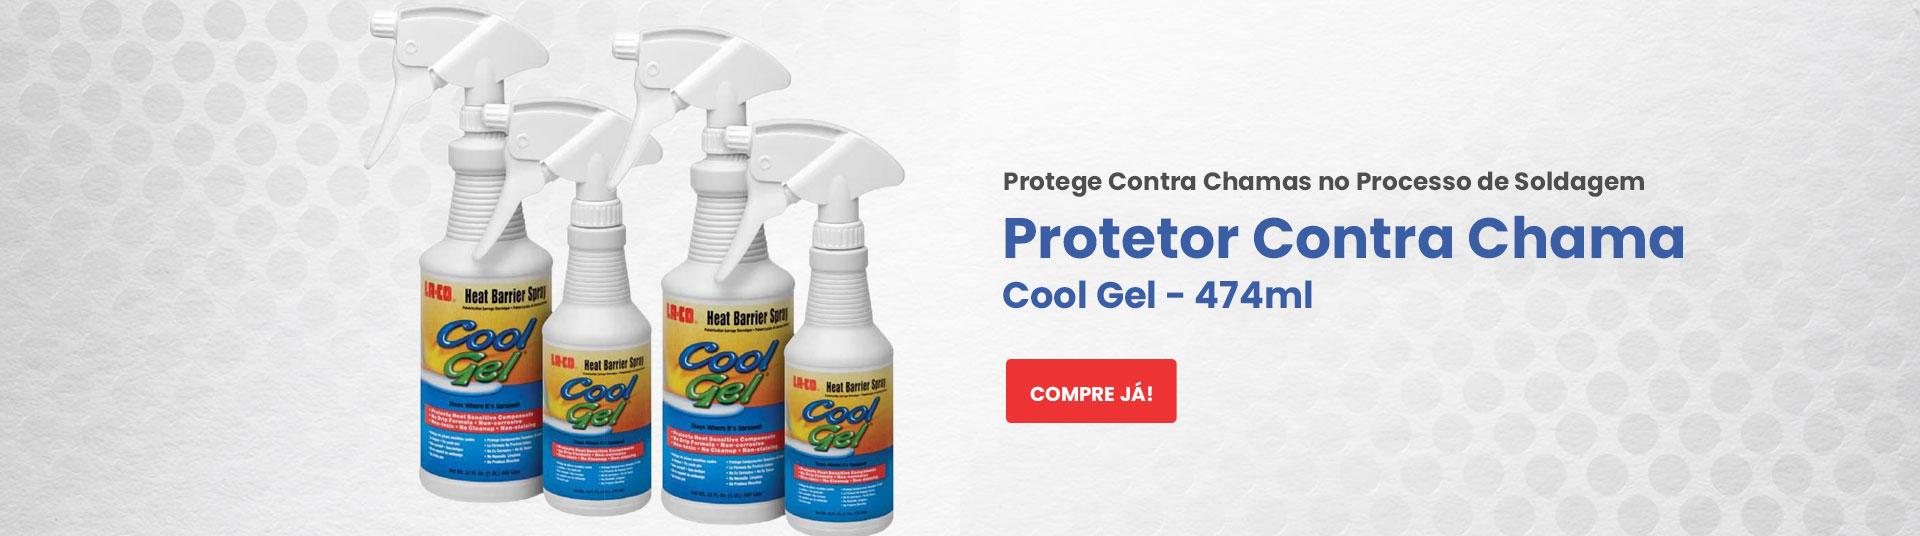 Protetor Contra Chama Cool Gel - 474ml